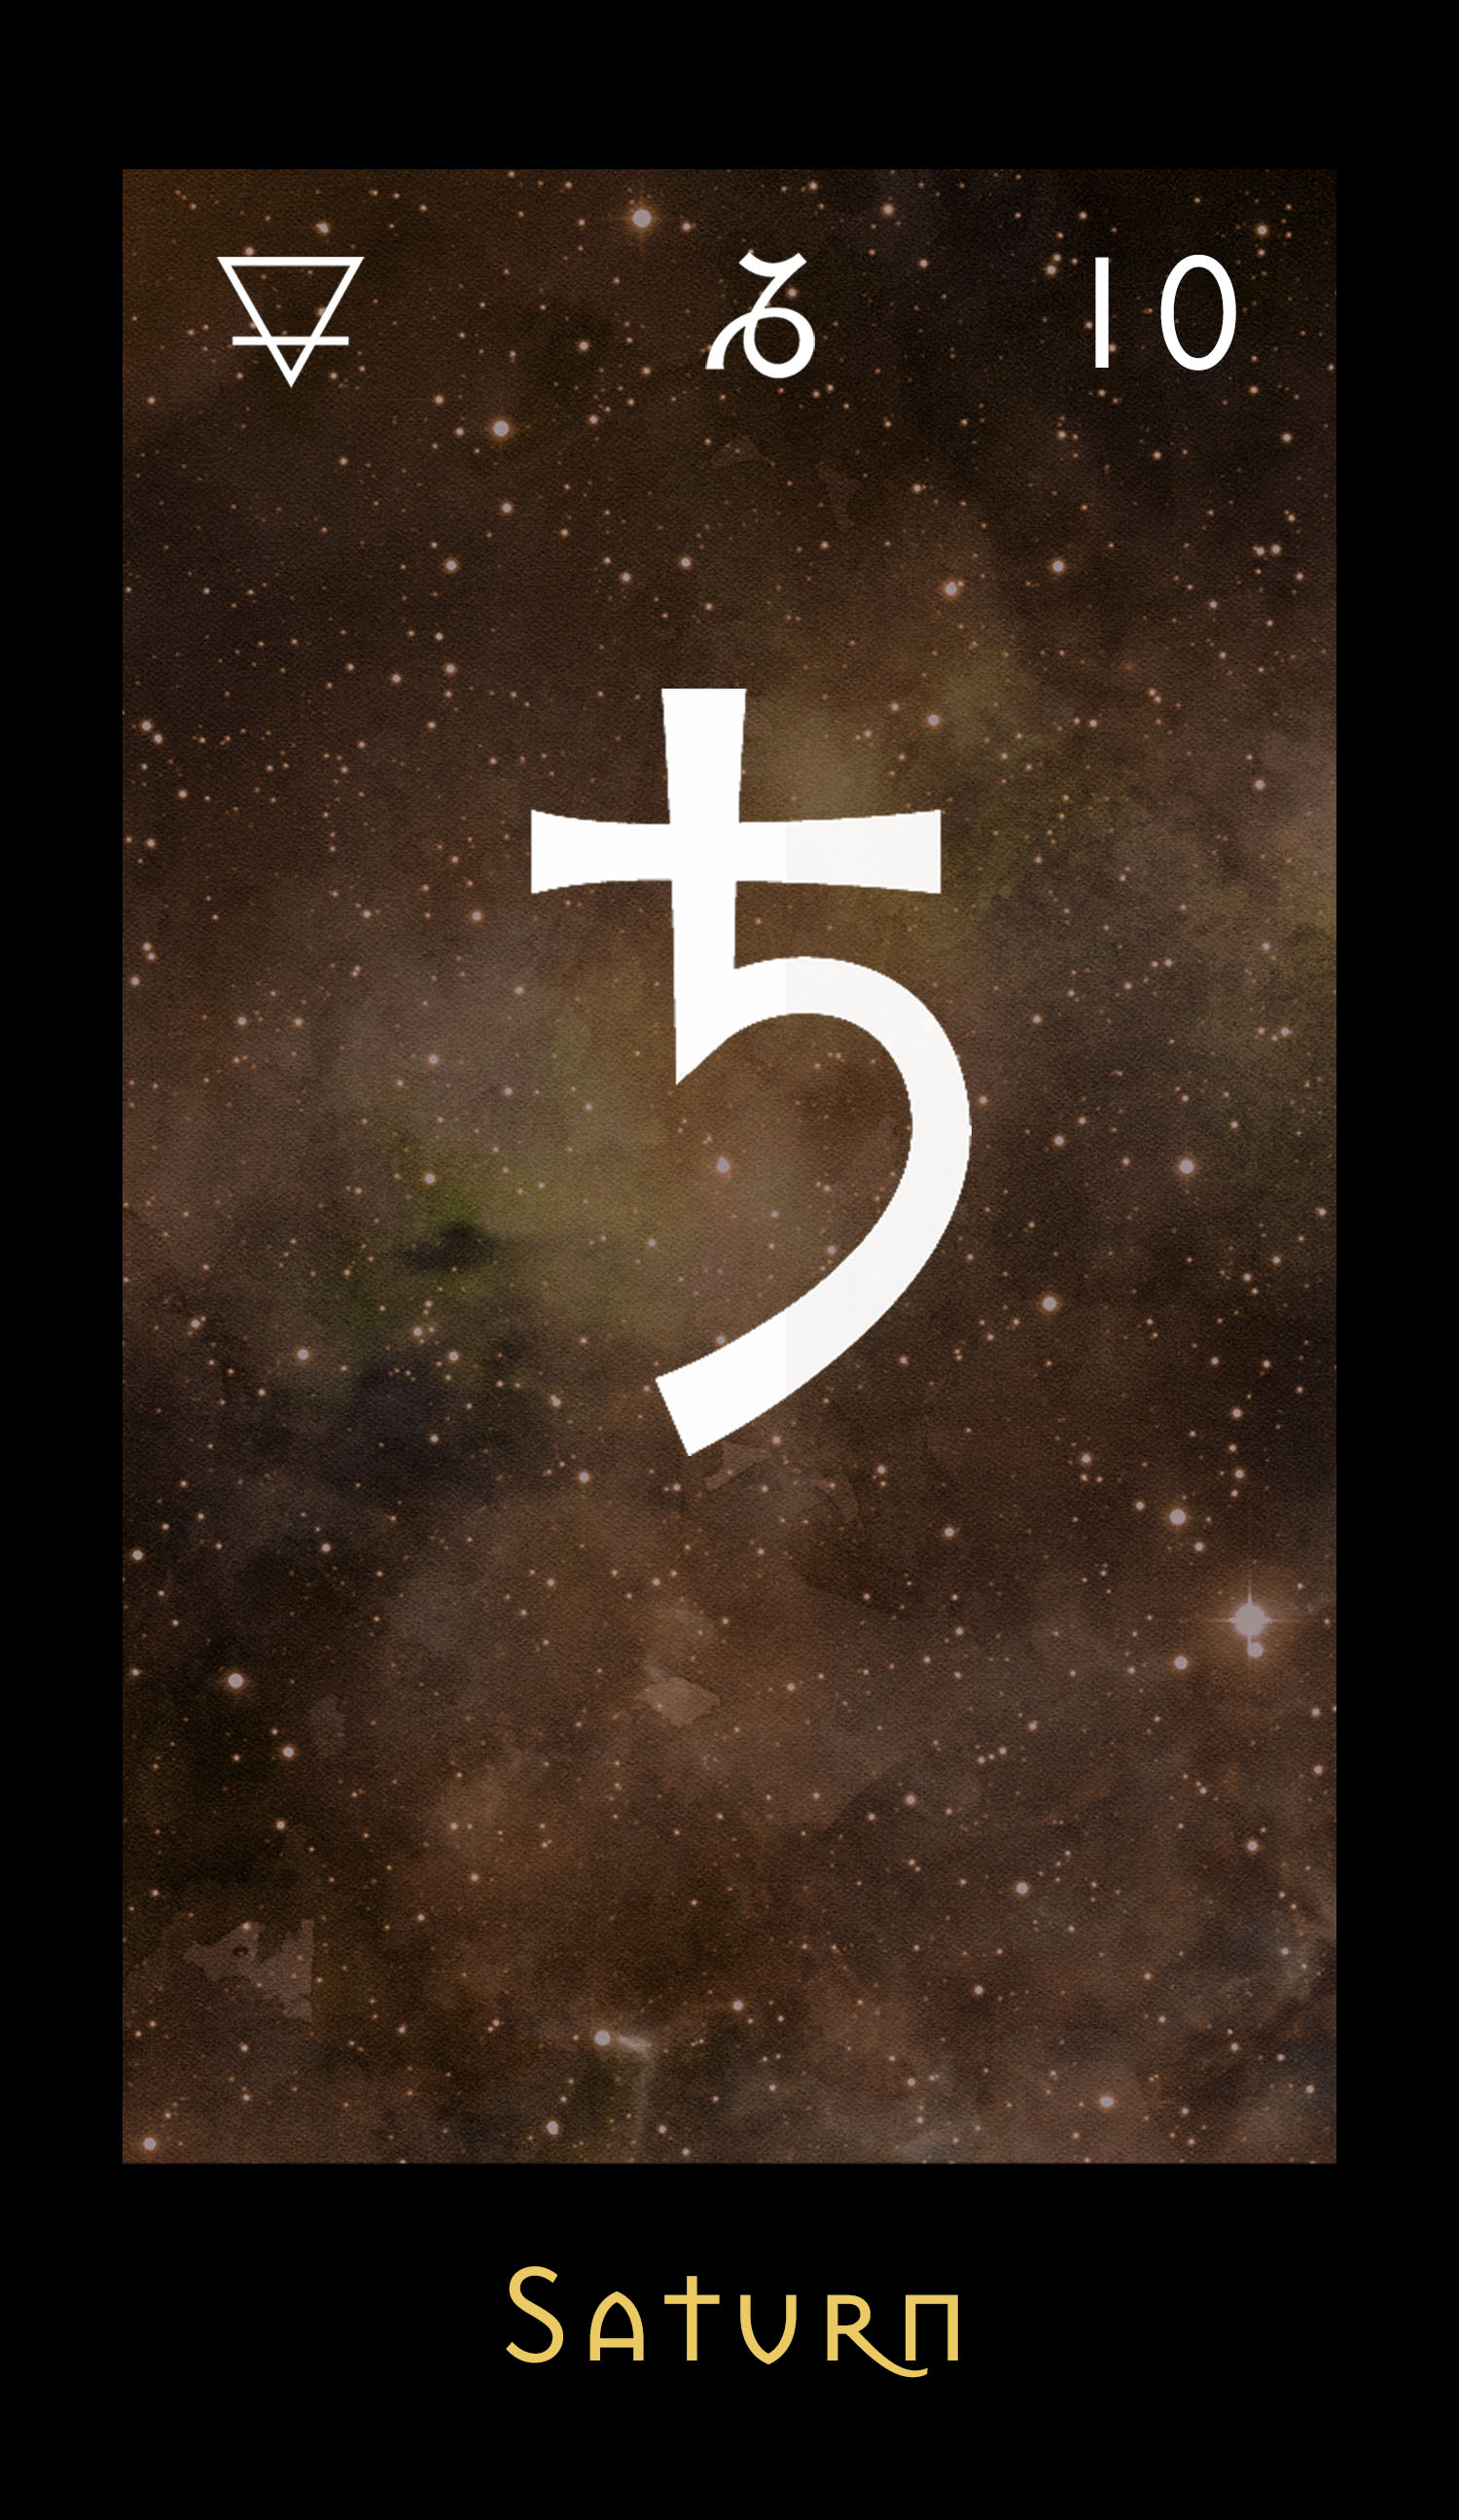 Saturn copy.jpg